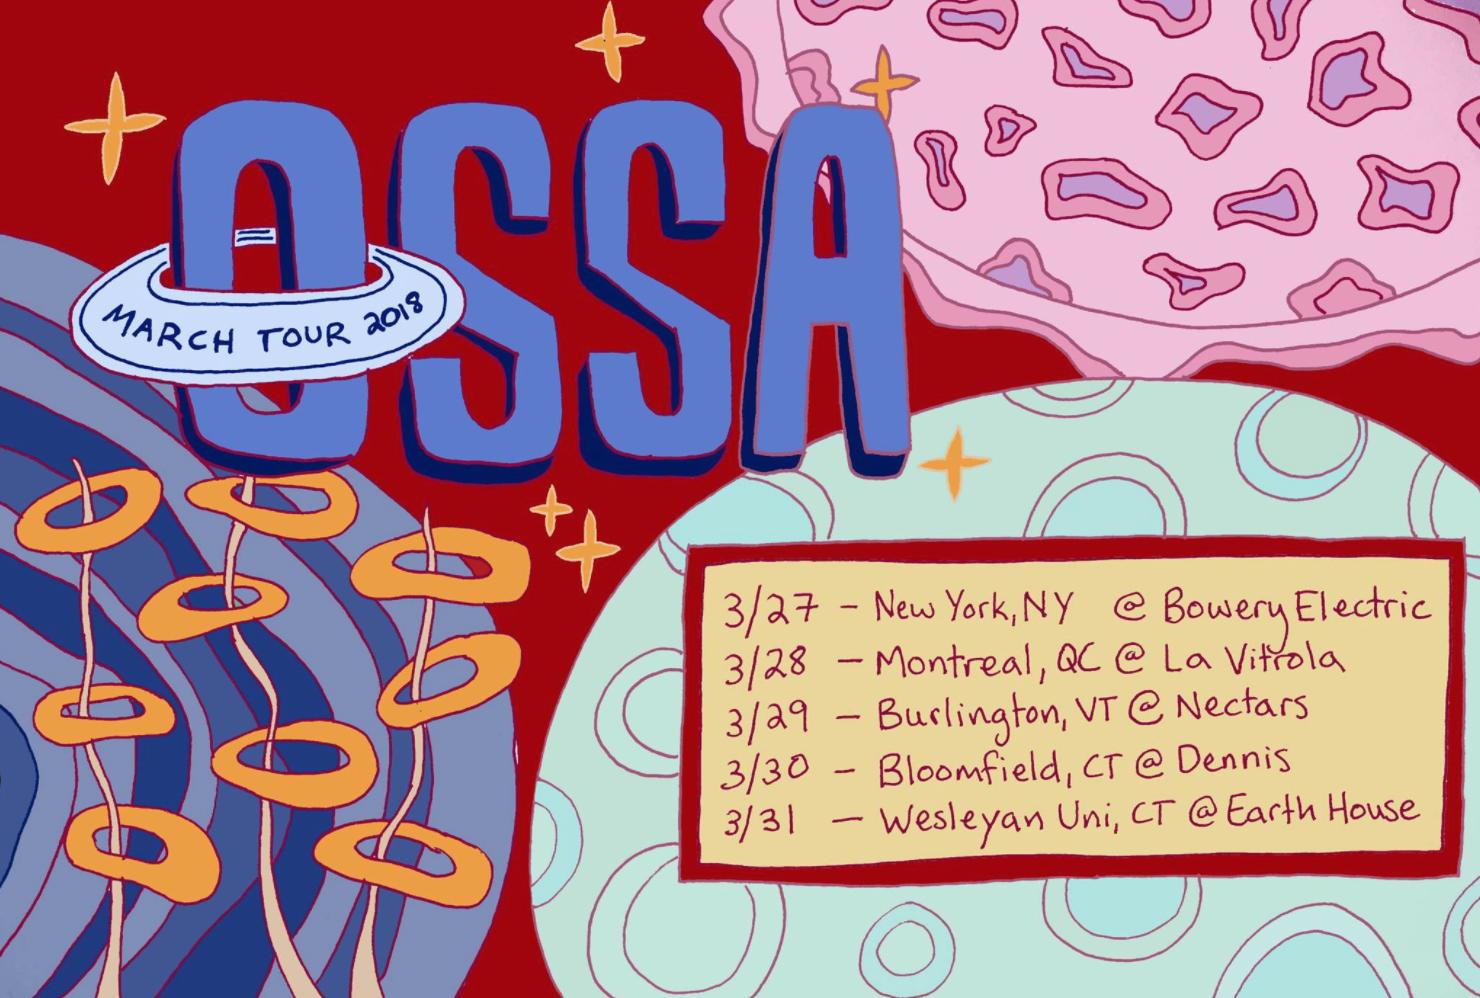 Ossa Band Flyer, 2018